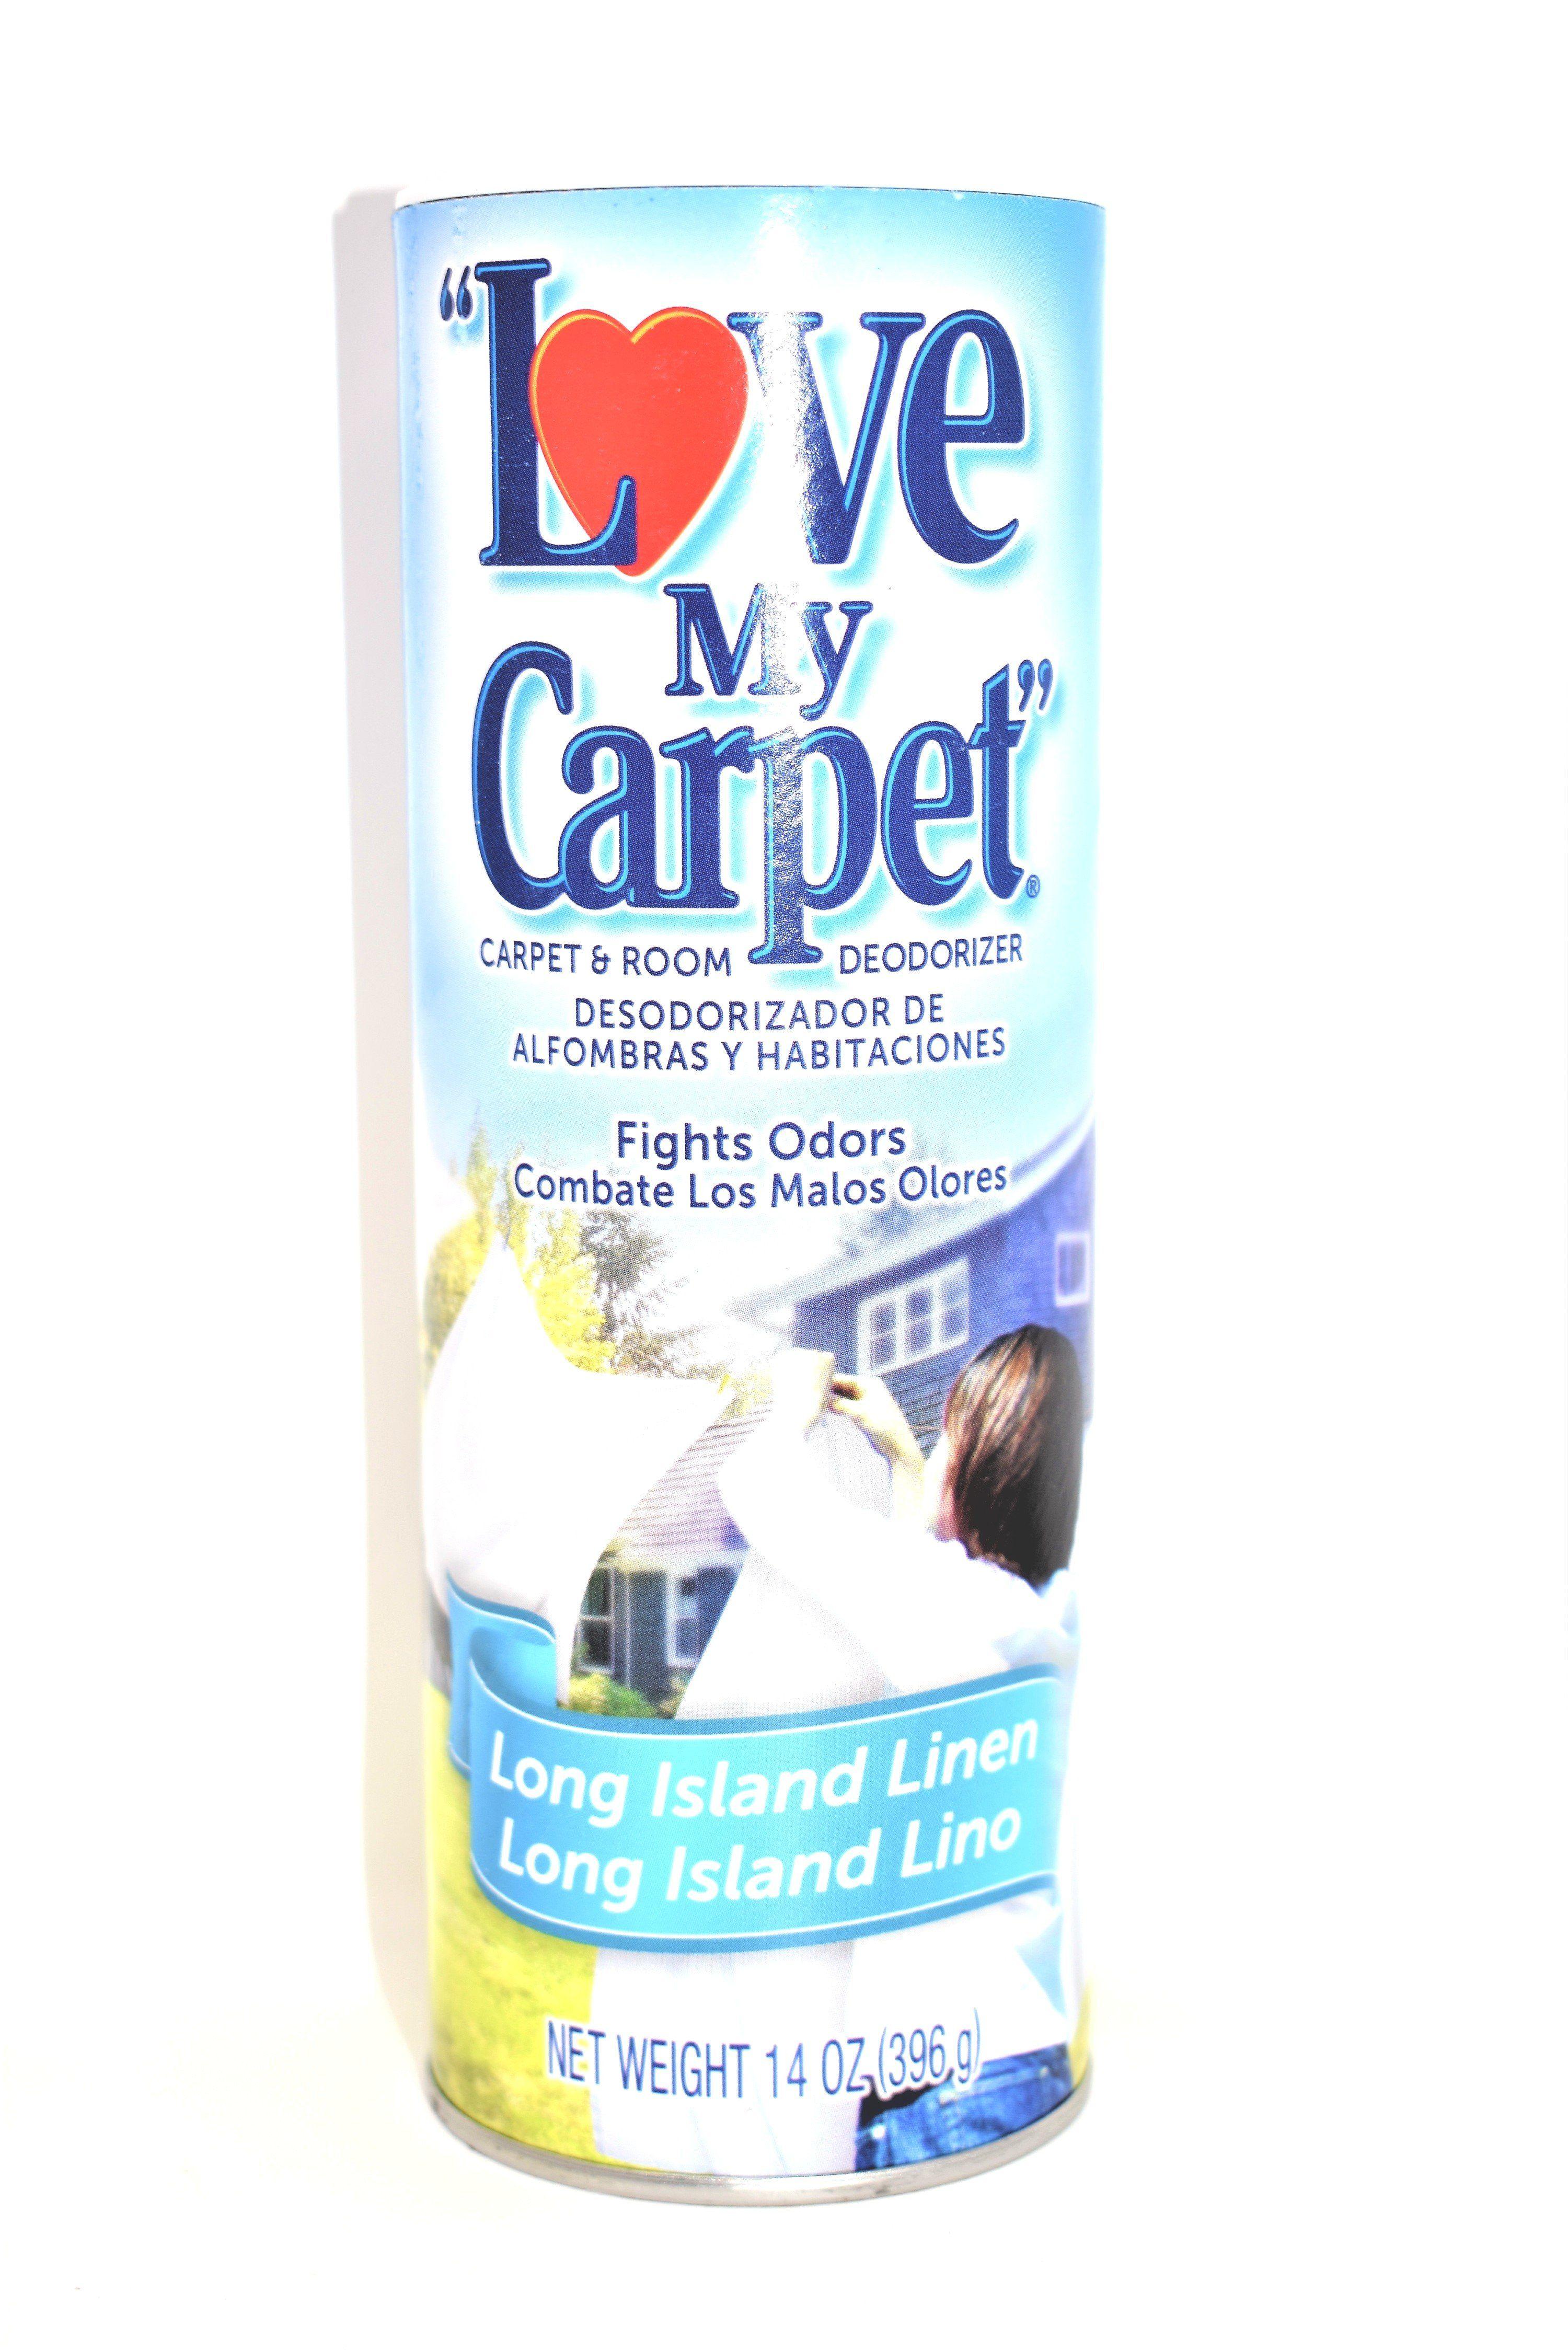 Love My Carpet Long Island Linen Carpet Room Deodorizer 14 Oz Room Deodorizer Deodorant Clean Scents